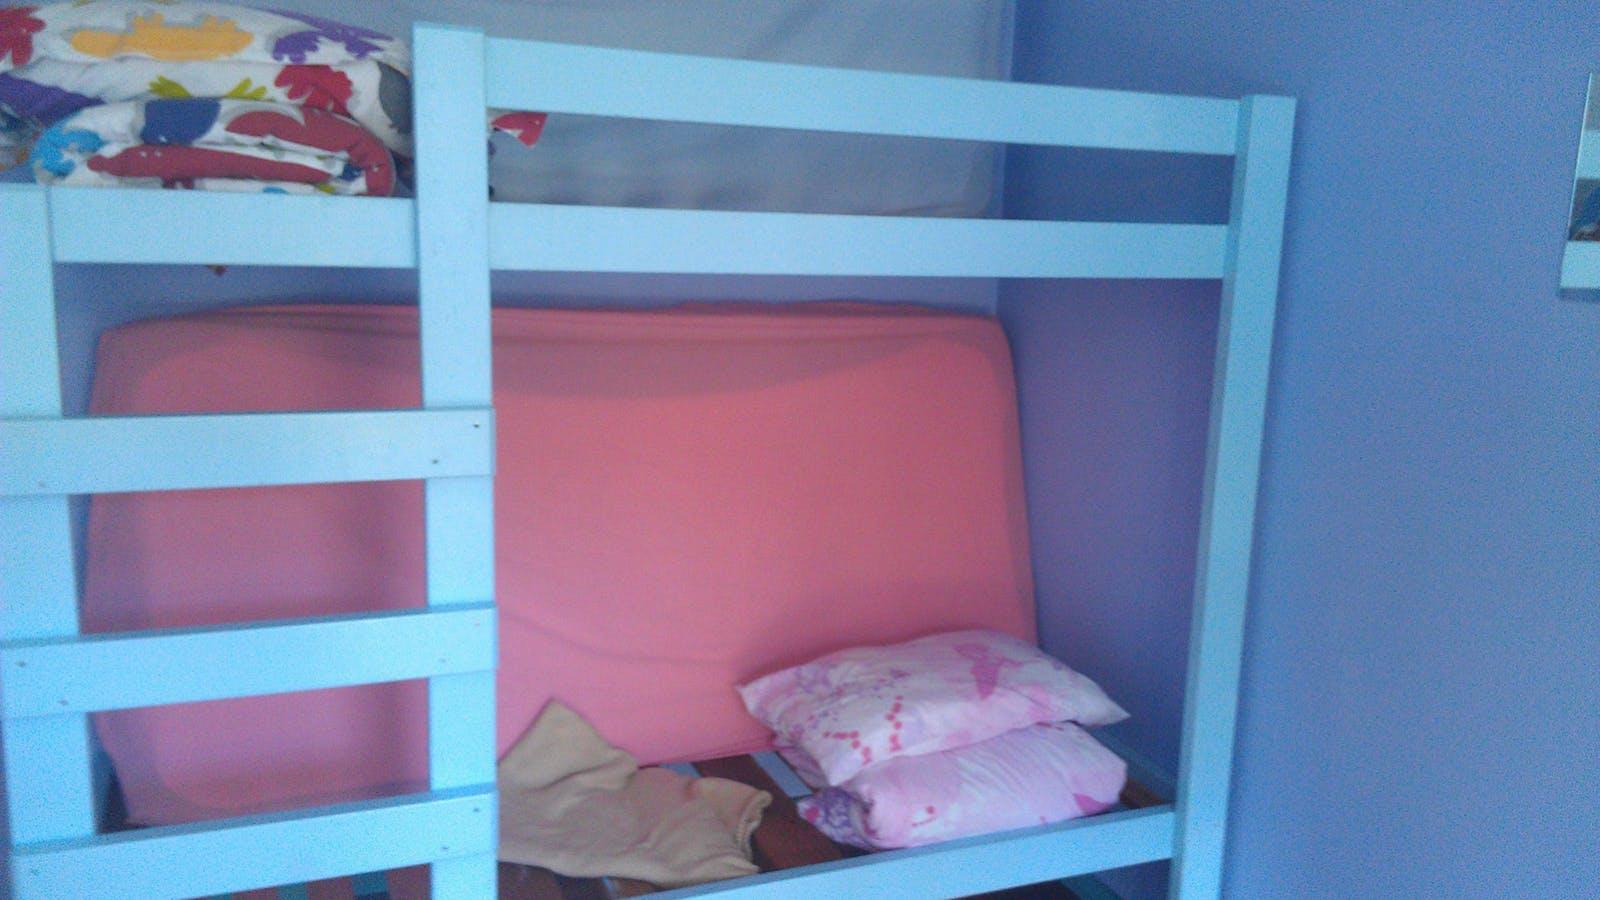 Dorm room bunks